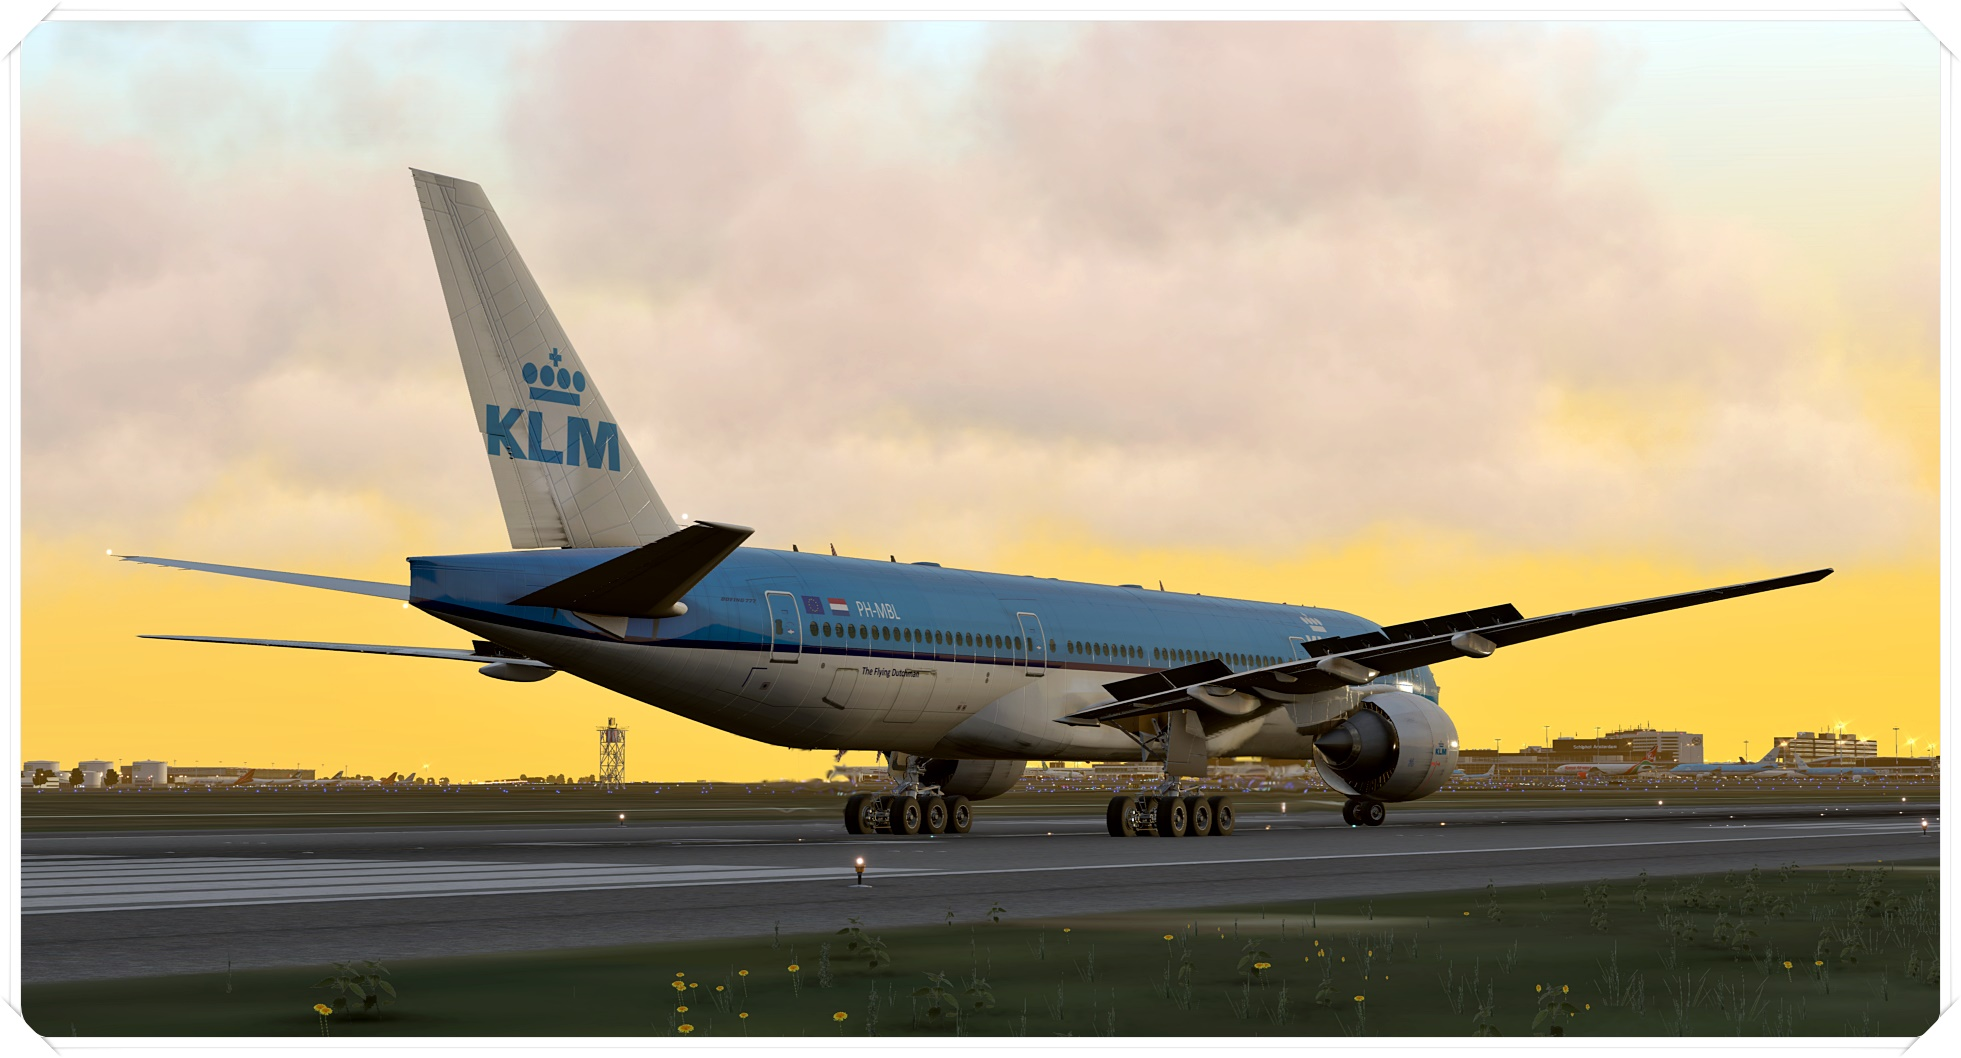 777-200lr_3taome.jpg